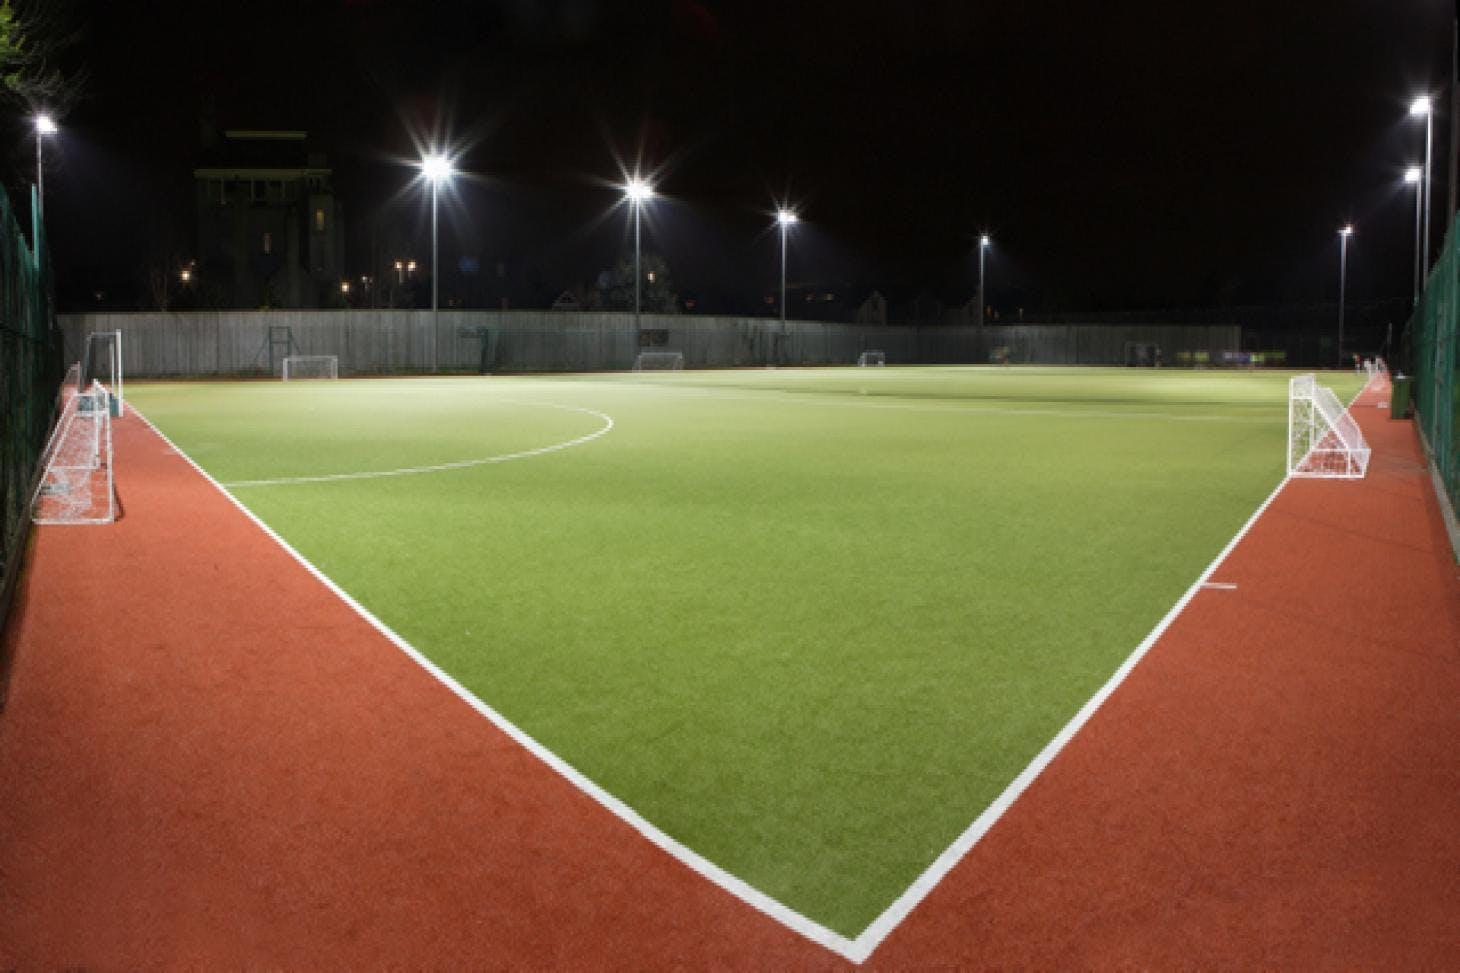 YMCA Sandymount Outdoor | Astroturf hockey pitch